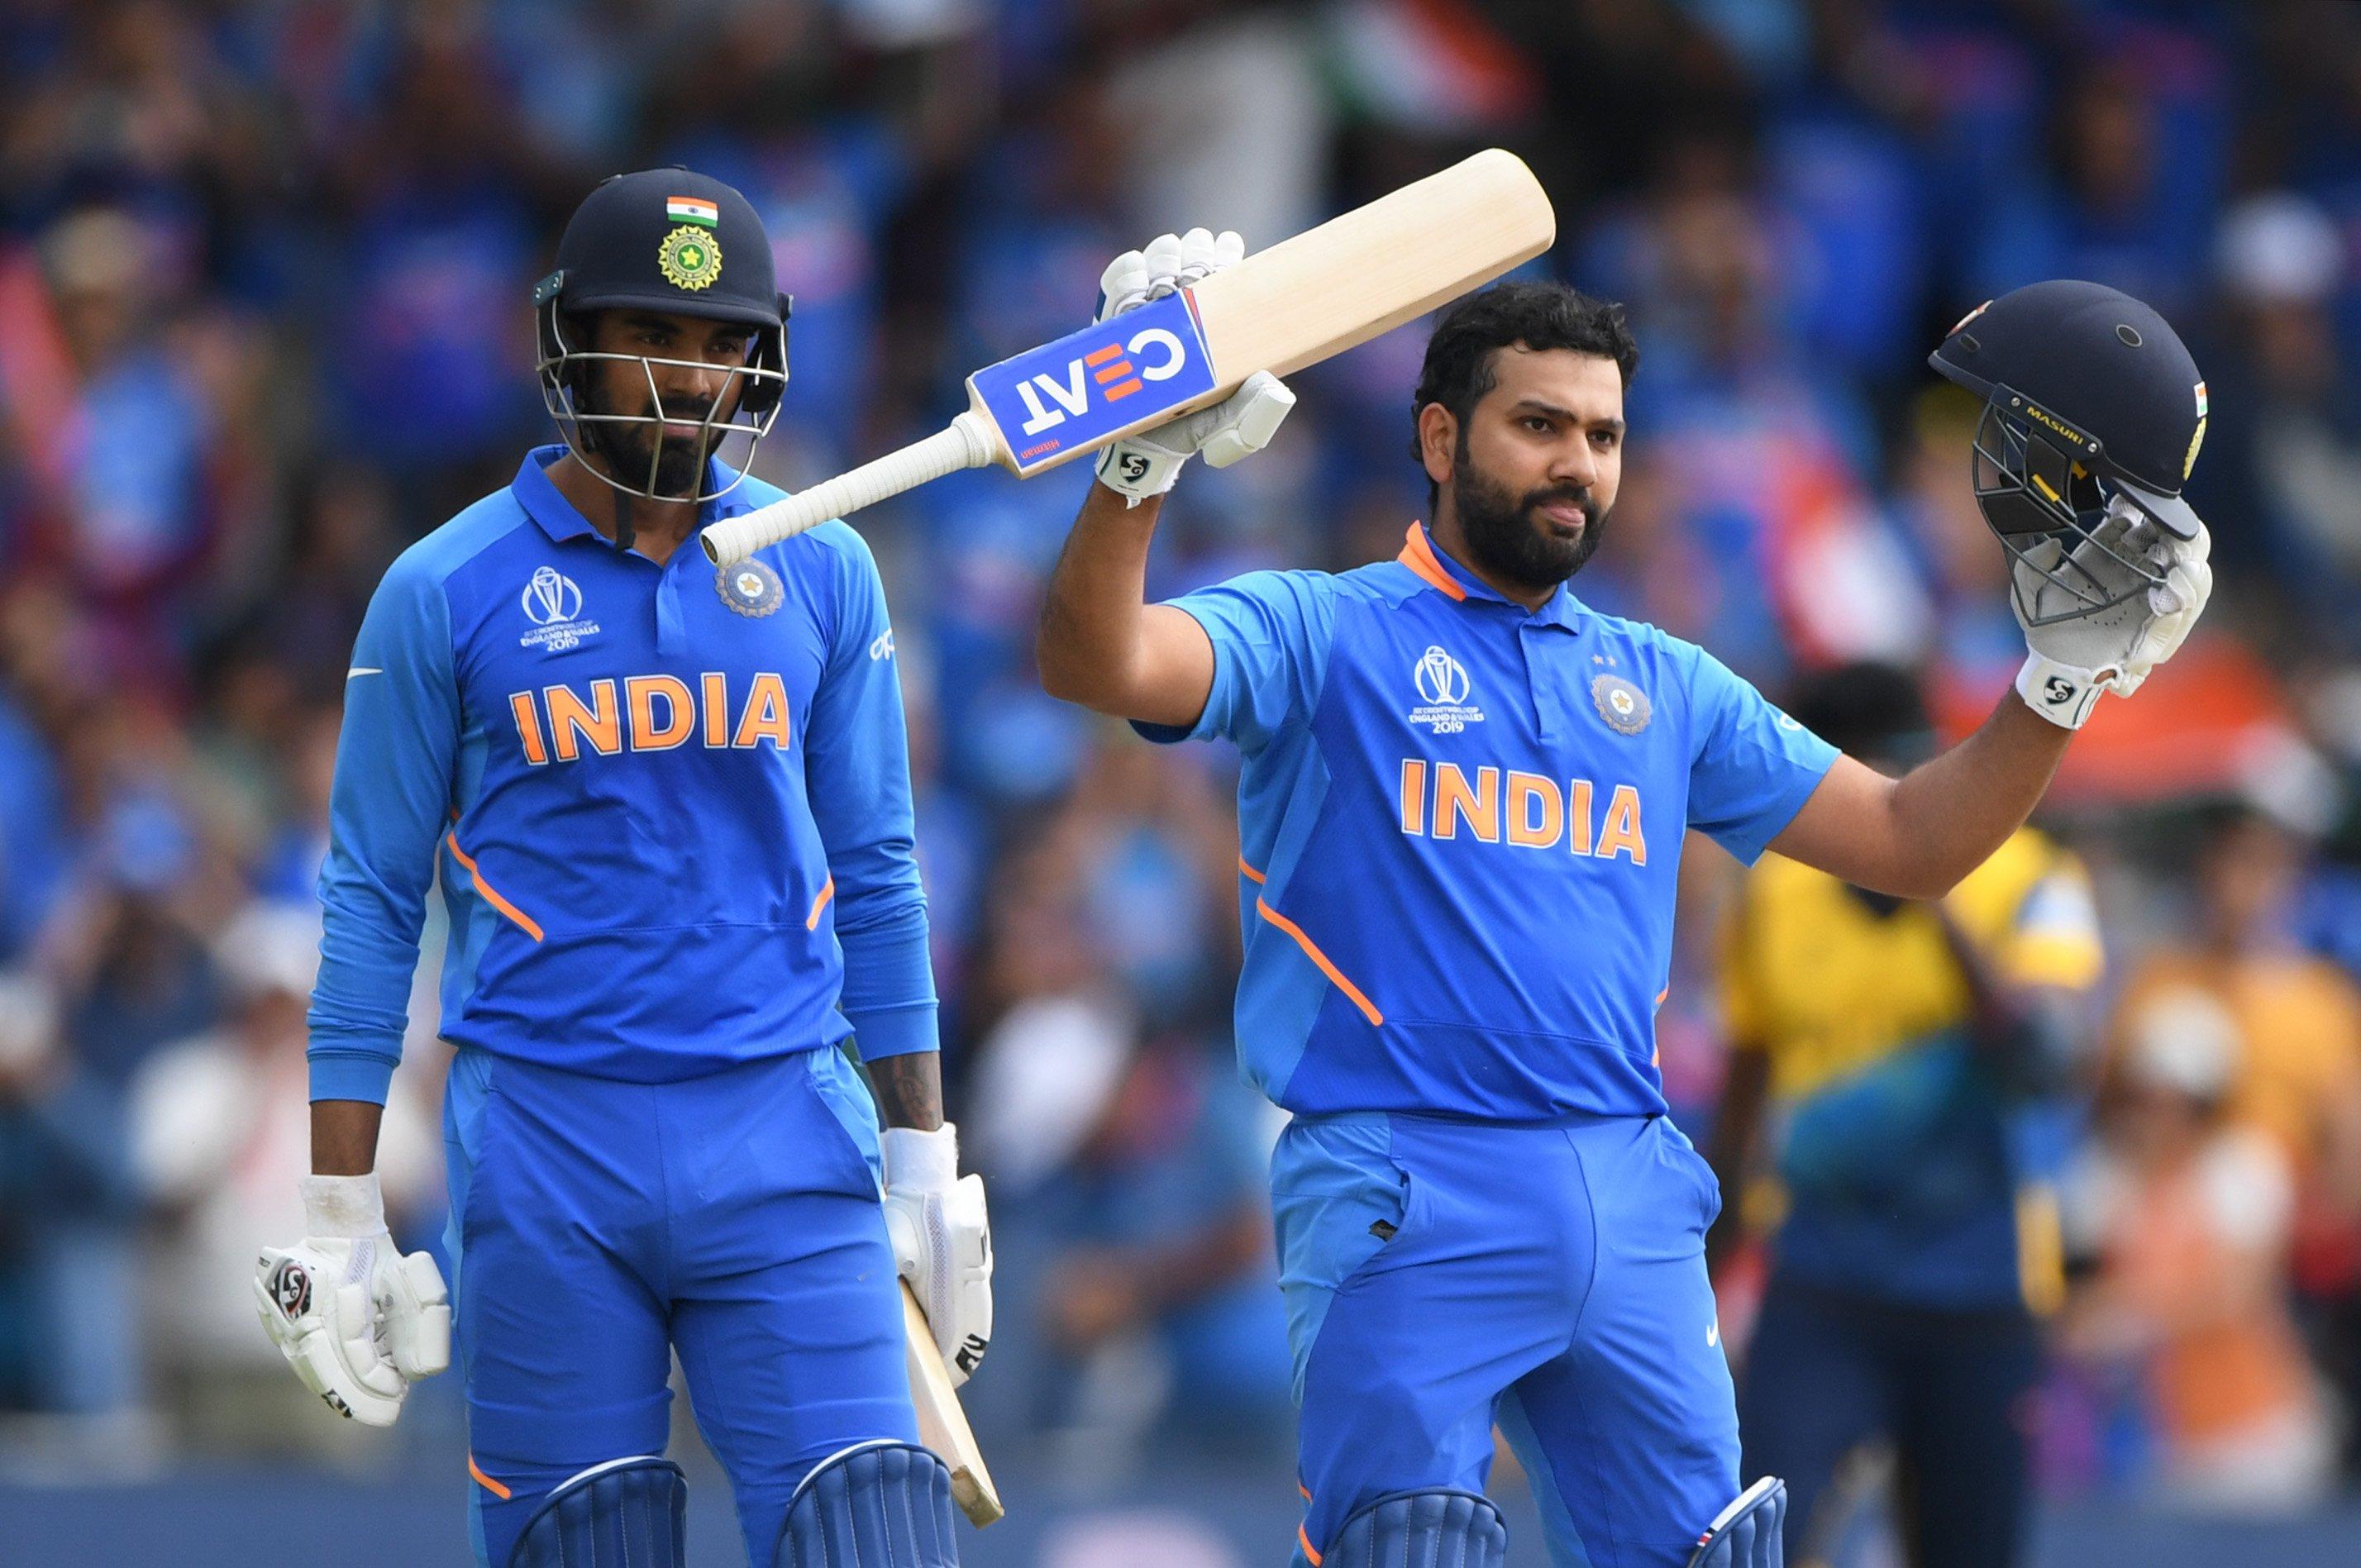 India's opener Rohit